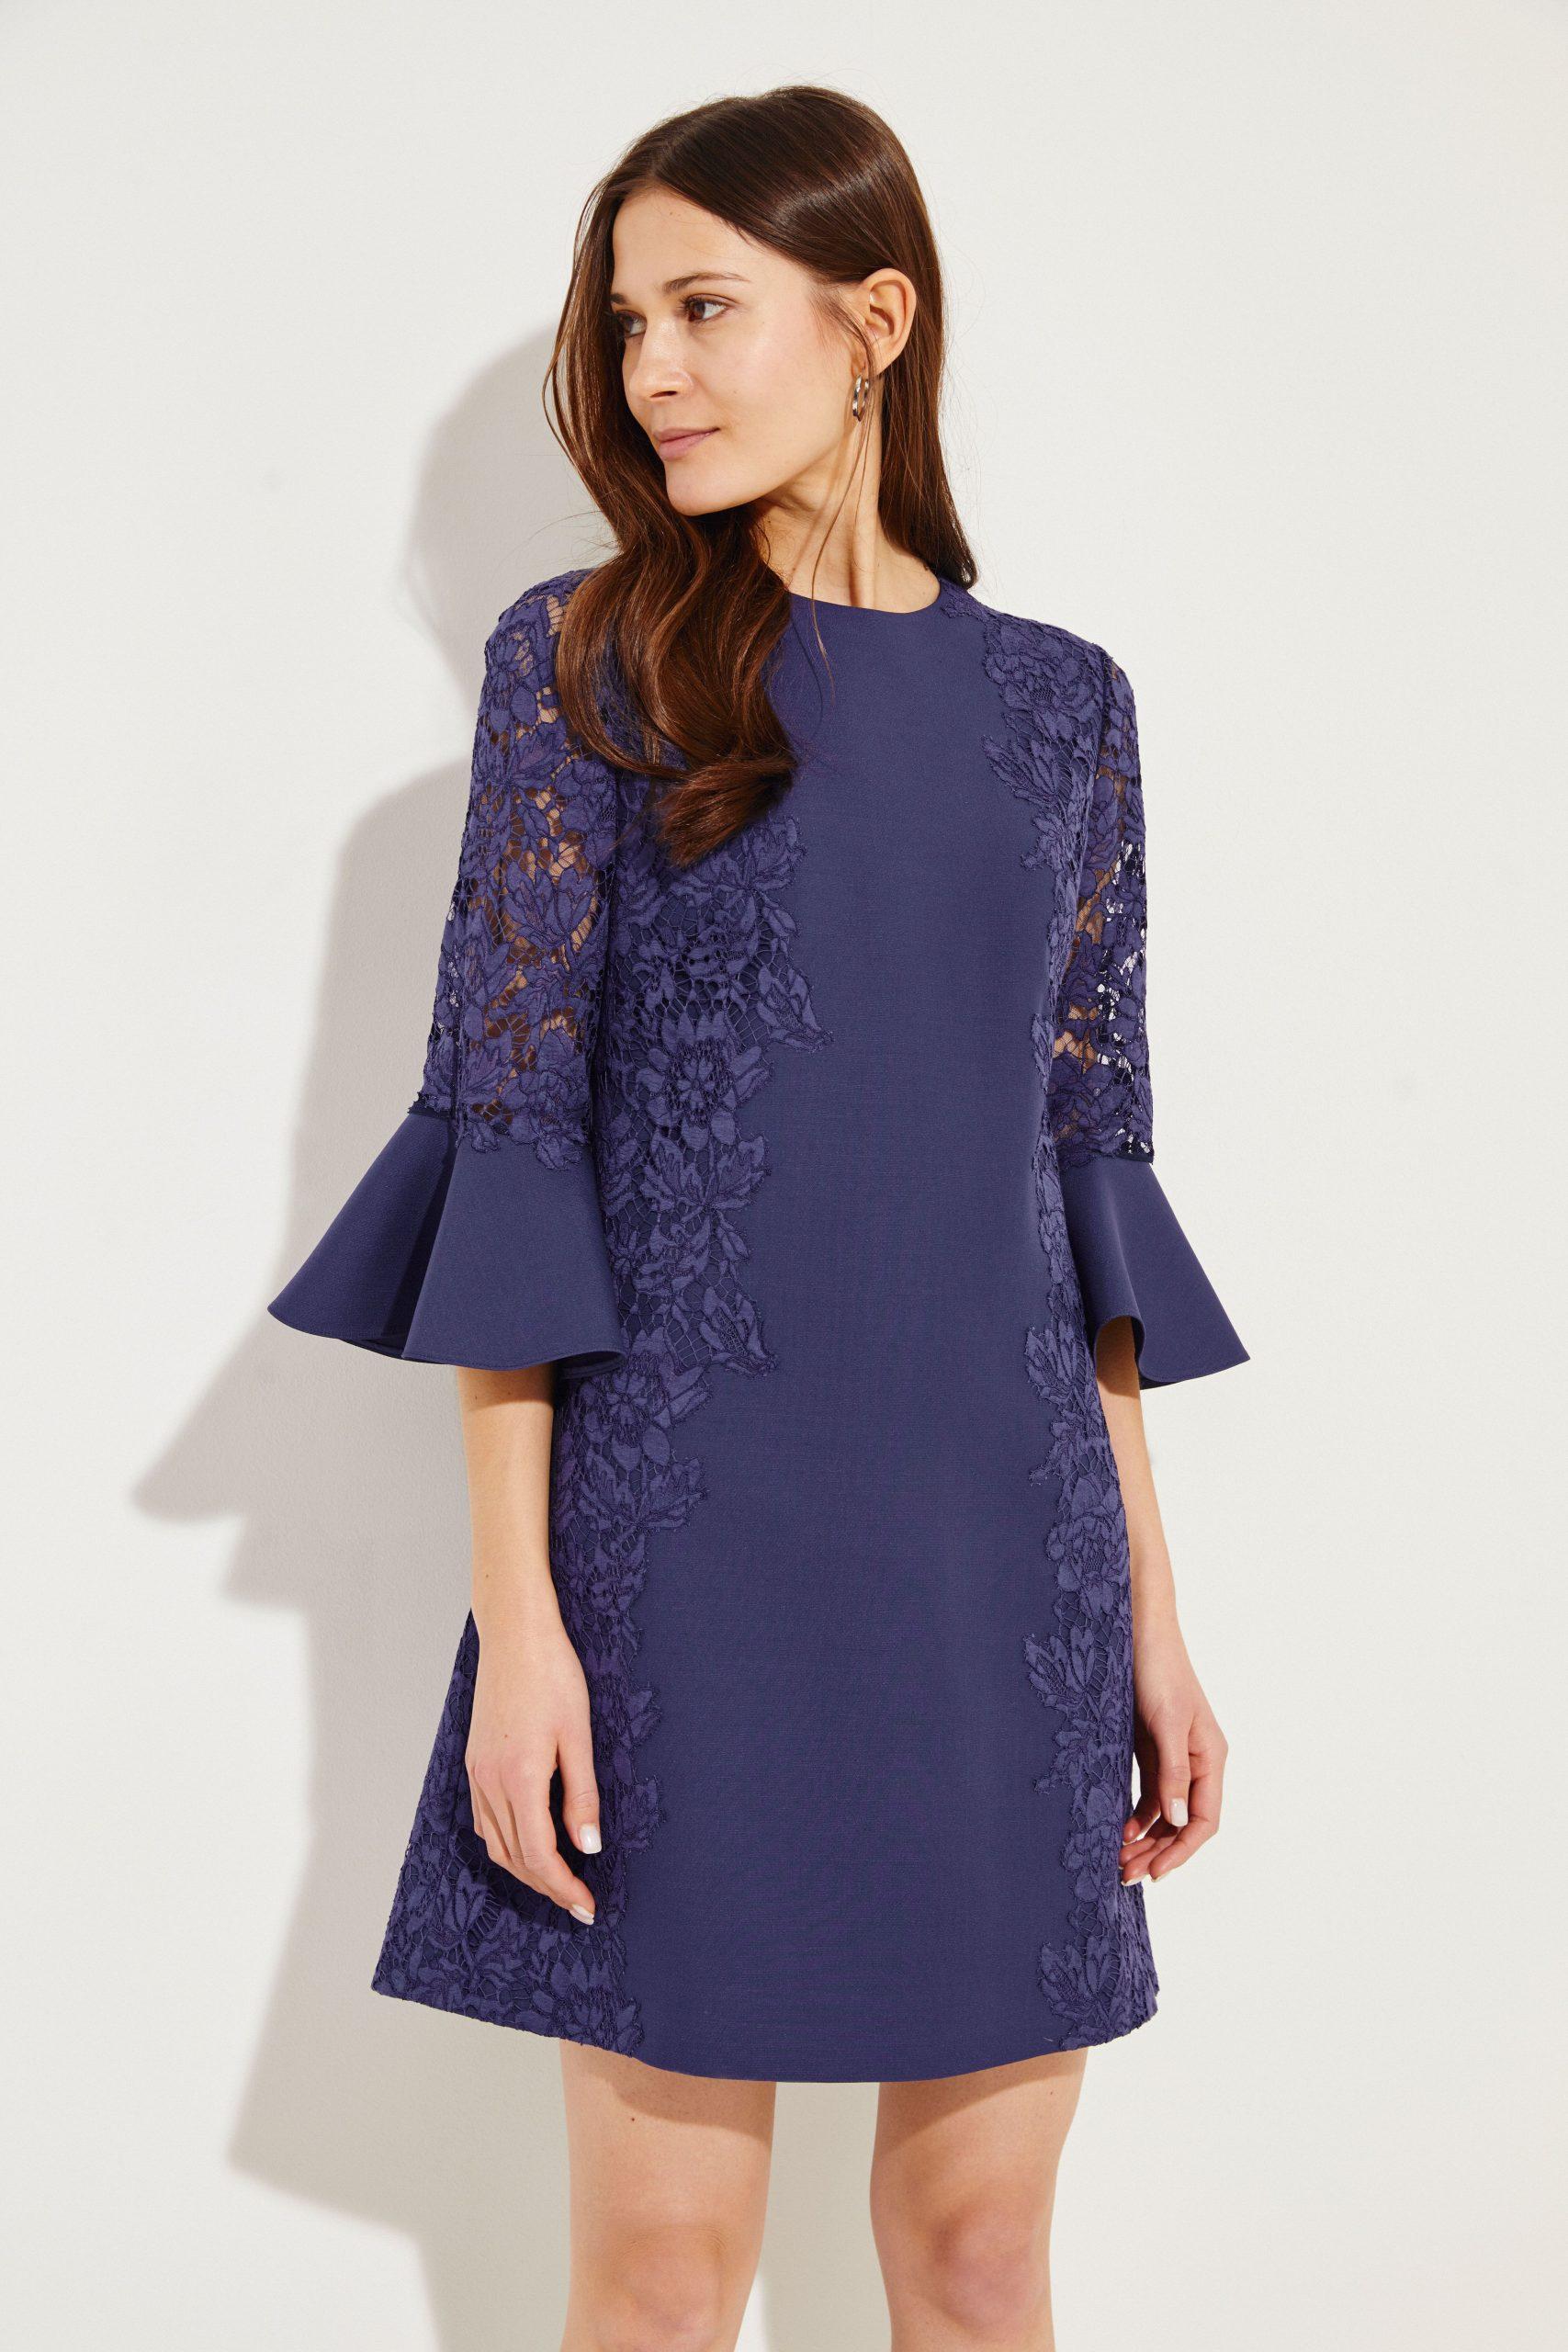 Valentino Midi Dress With Lace Navy  Kleid Spitze